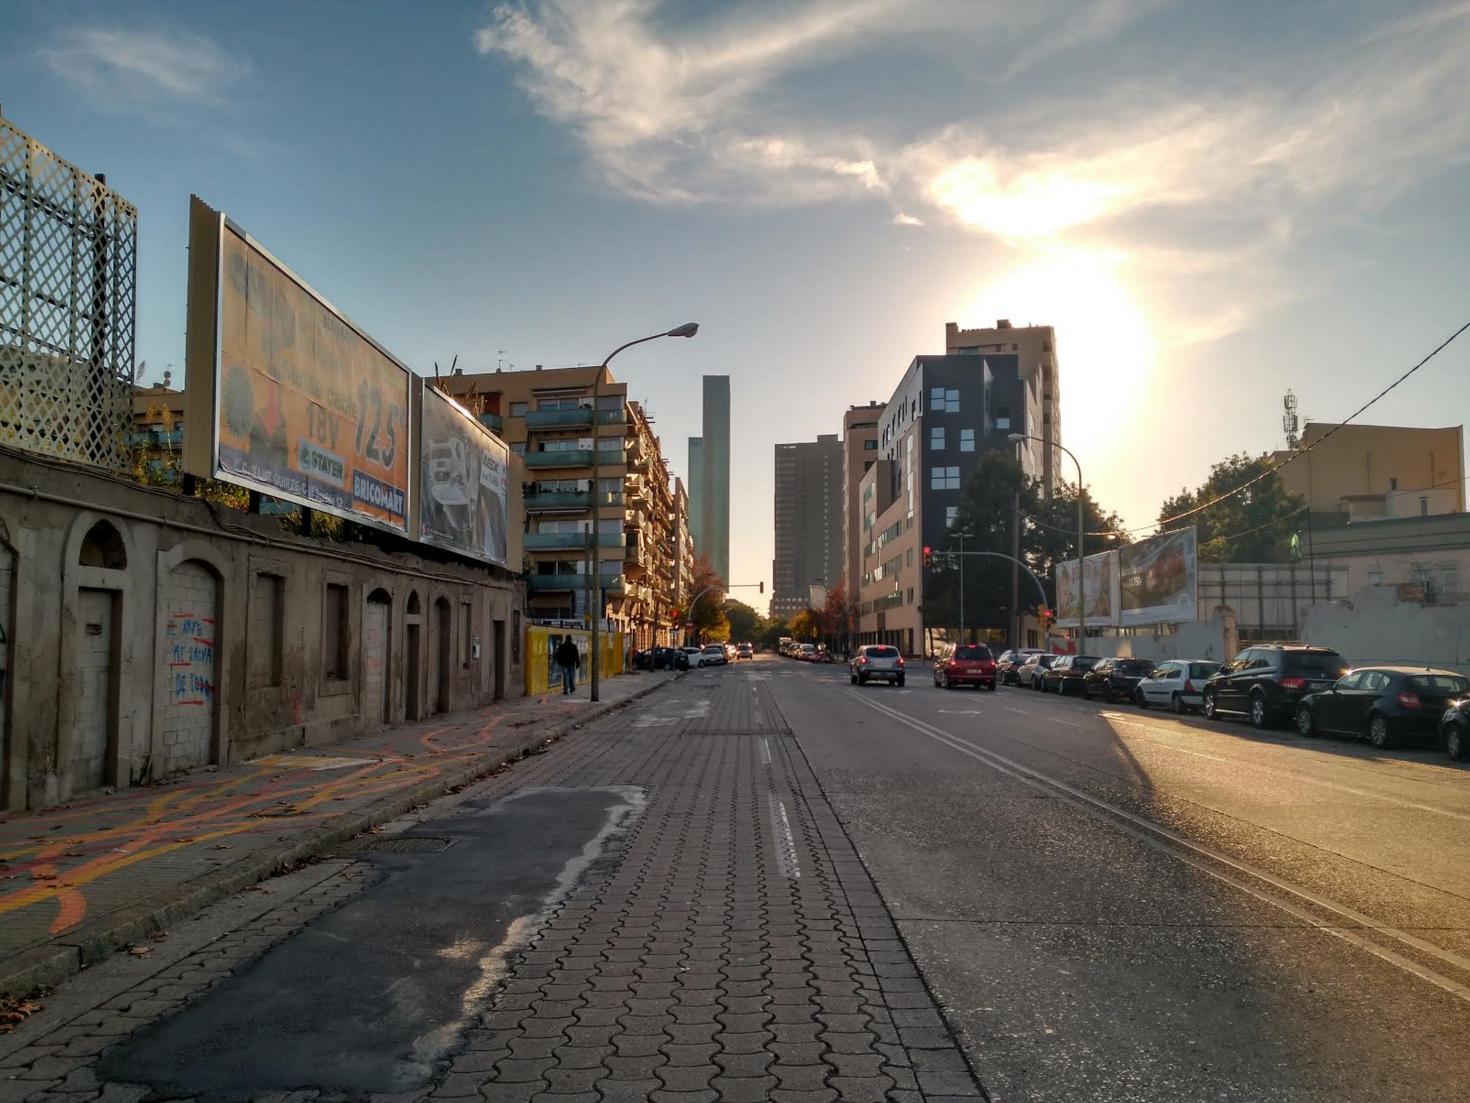 Pere IV Street, Barcelona. Author: Beatriz Guijarro